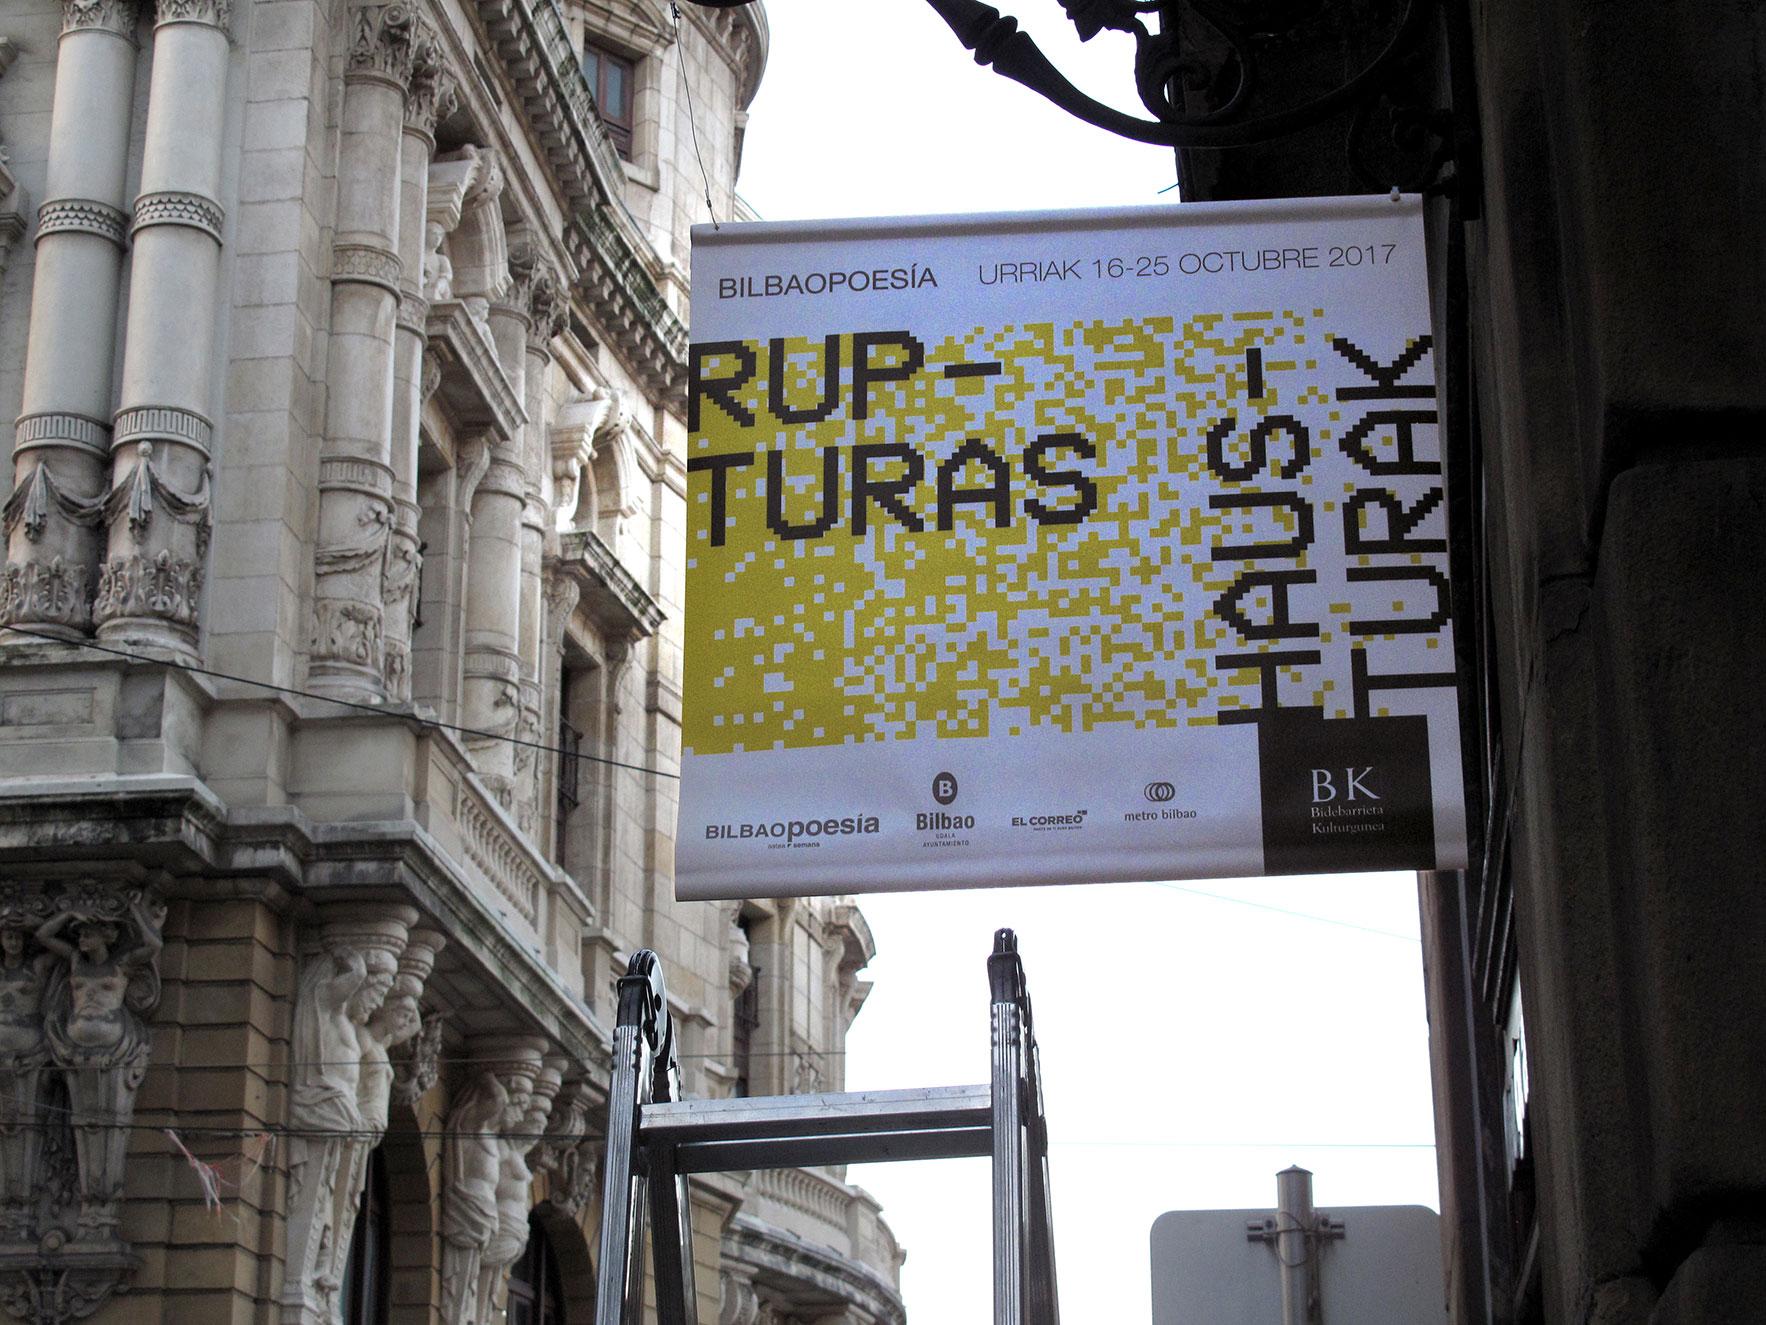 Bilbao poesía branding